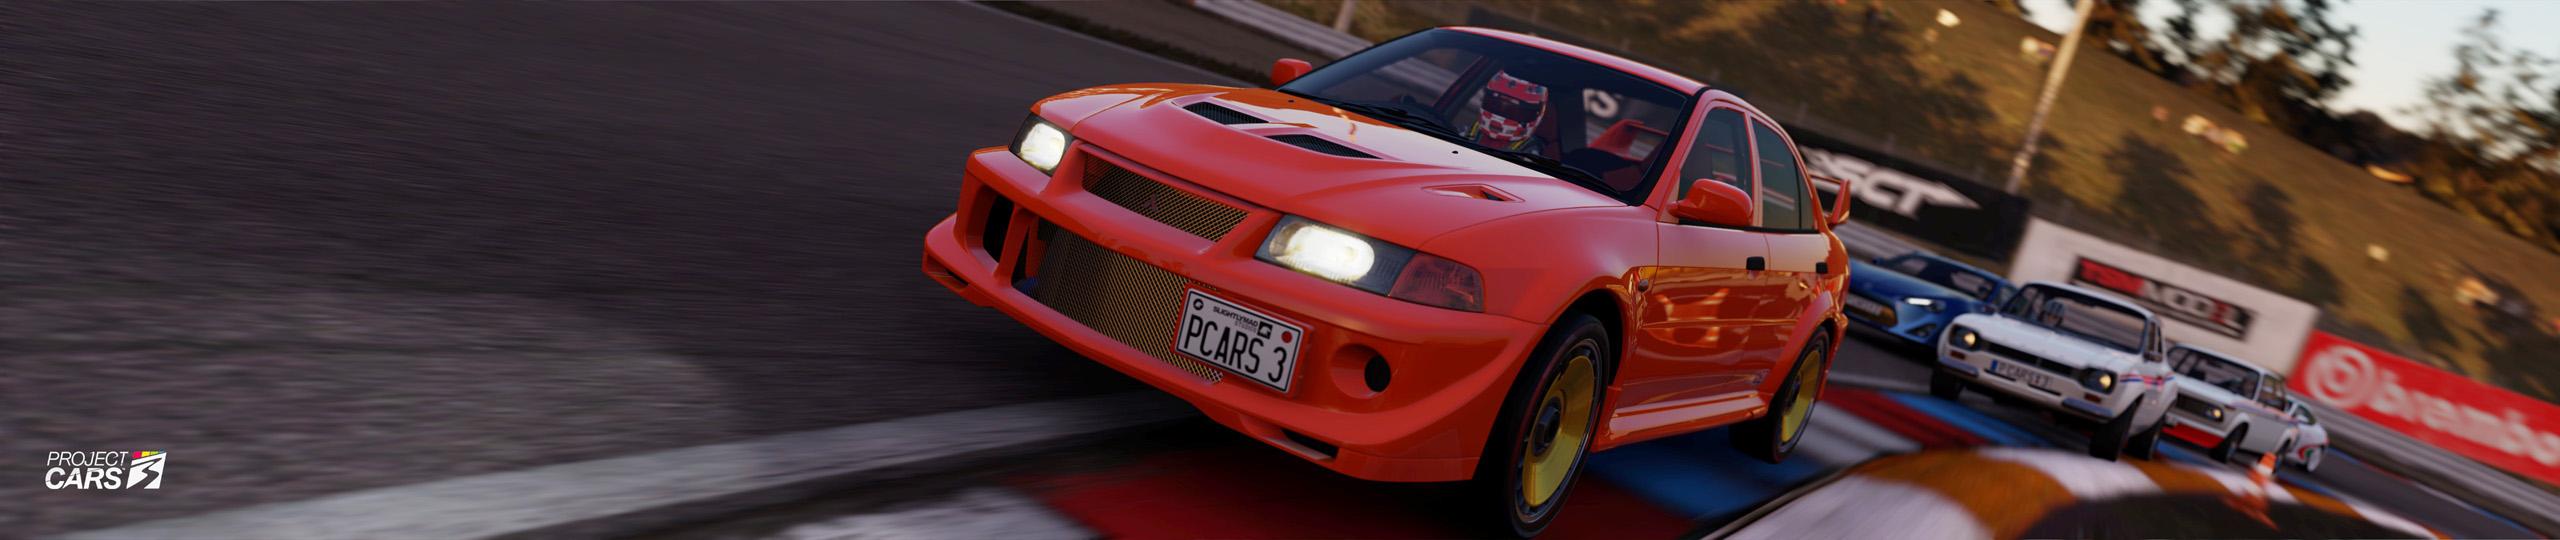 4 PROJECT CARS 3 LANCER EVO VI at BRNO GP crop copy.jpg